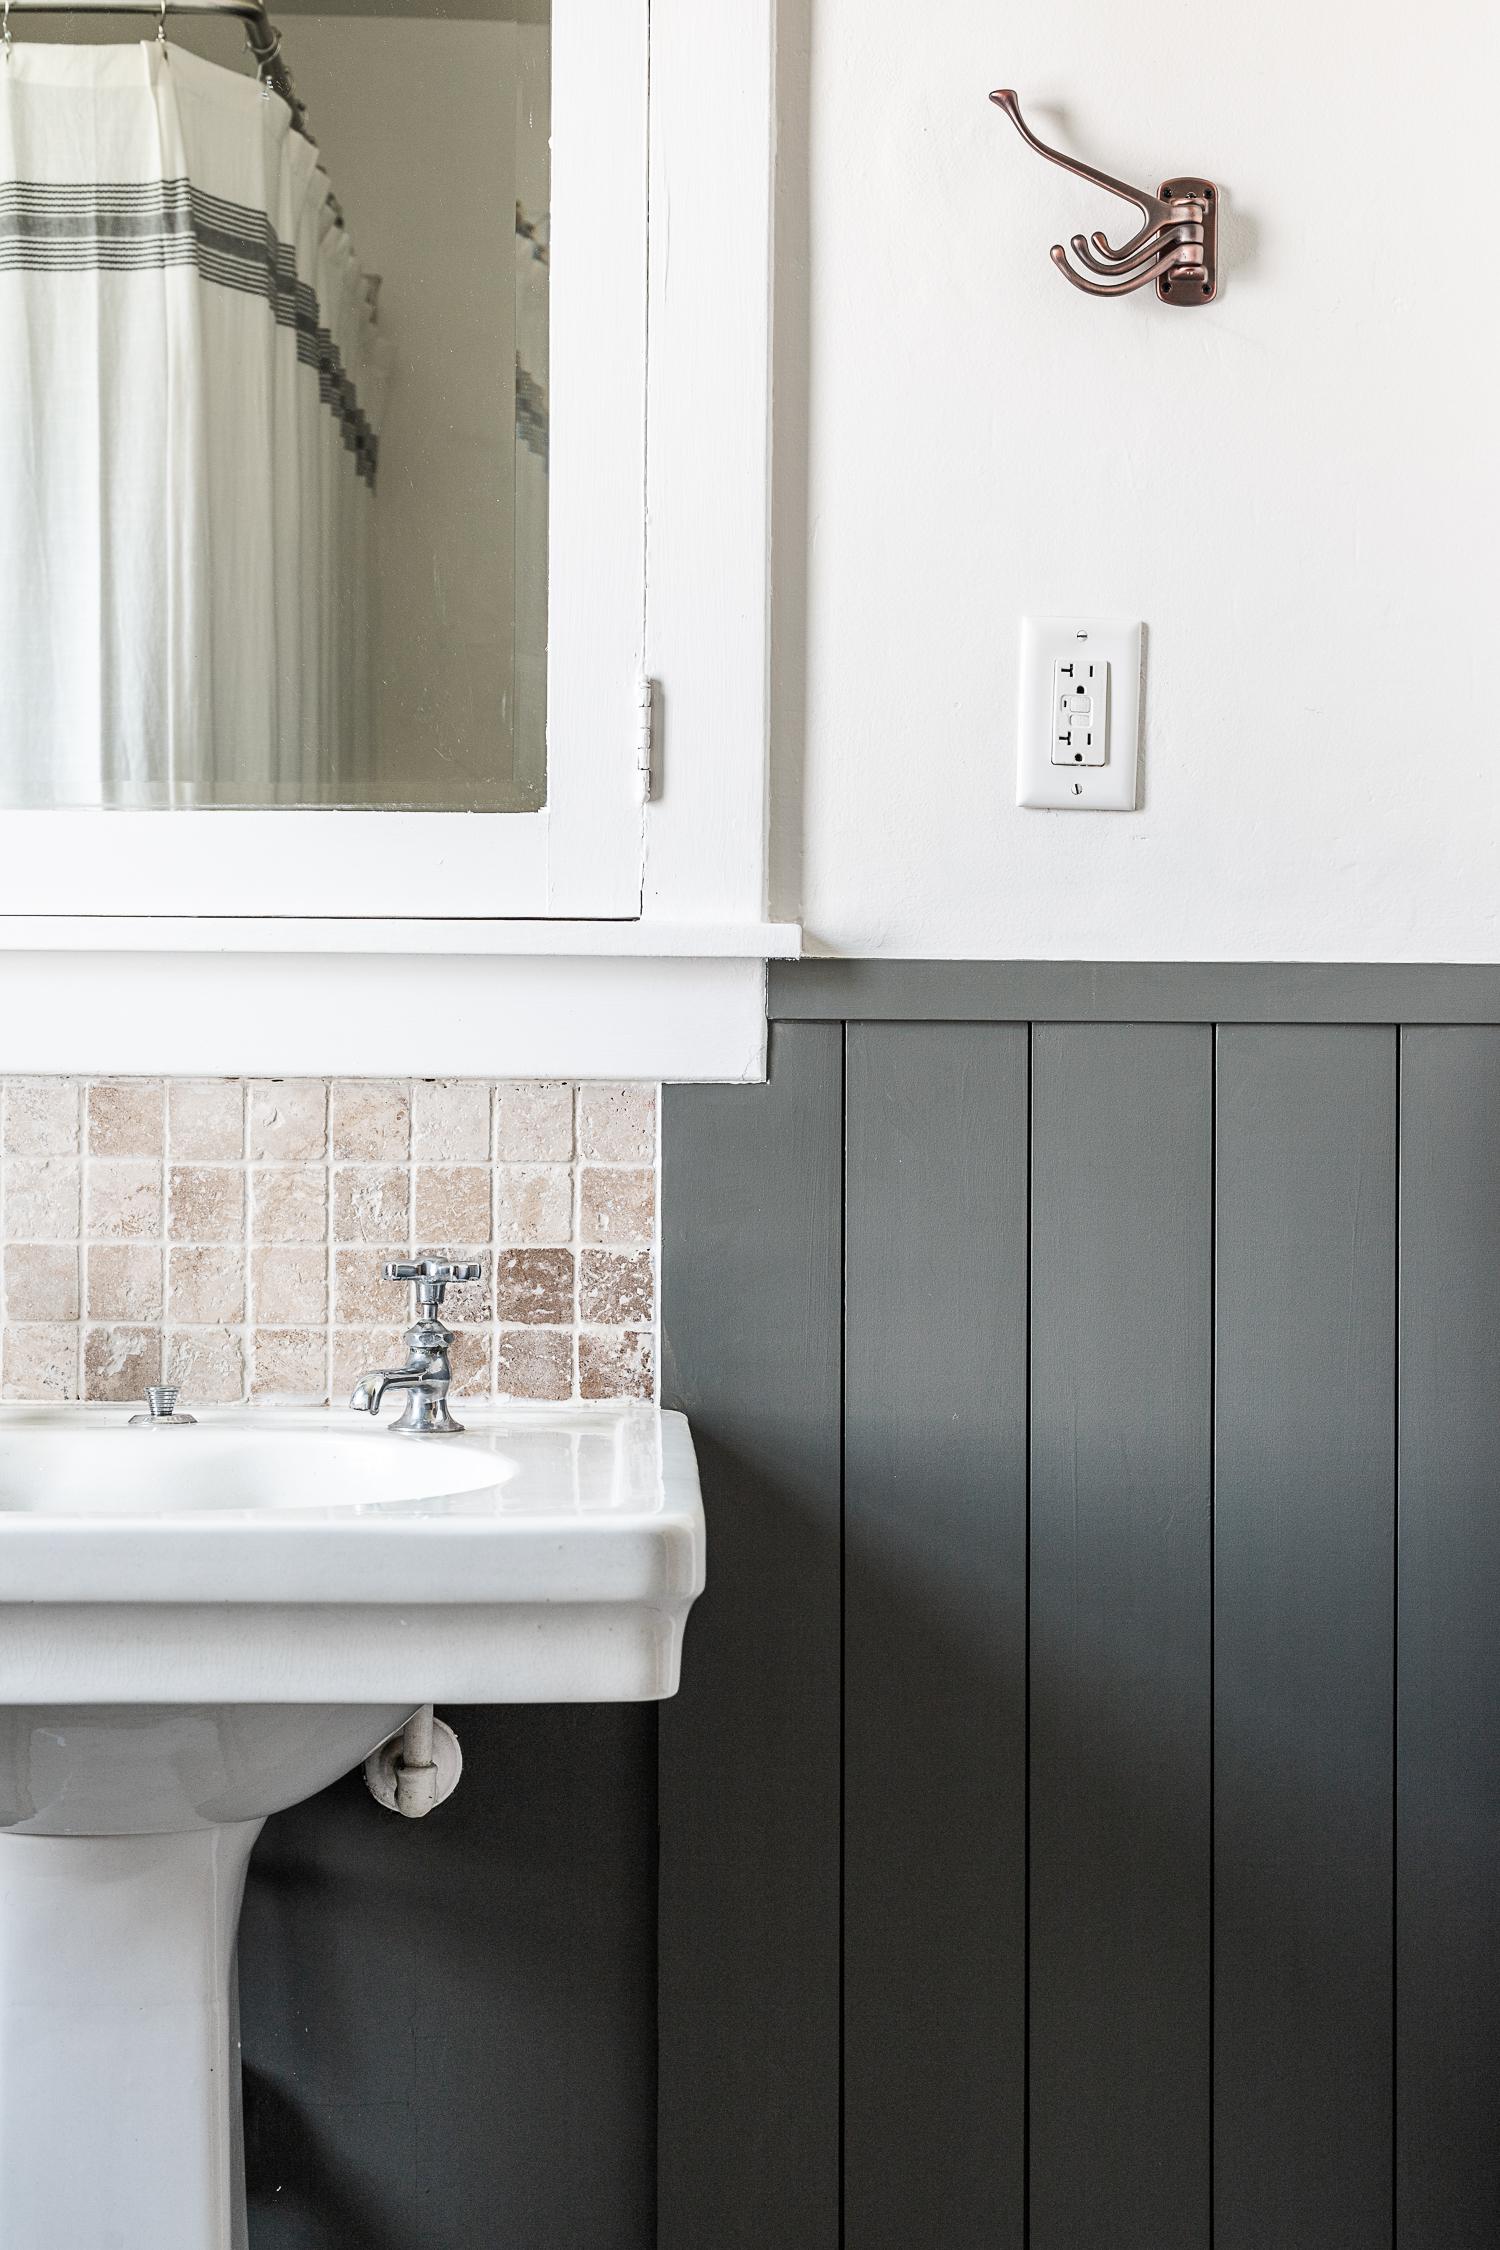 Boys Bathroom Makeover in a Historic Home